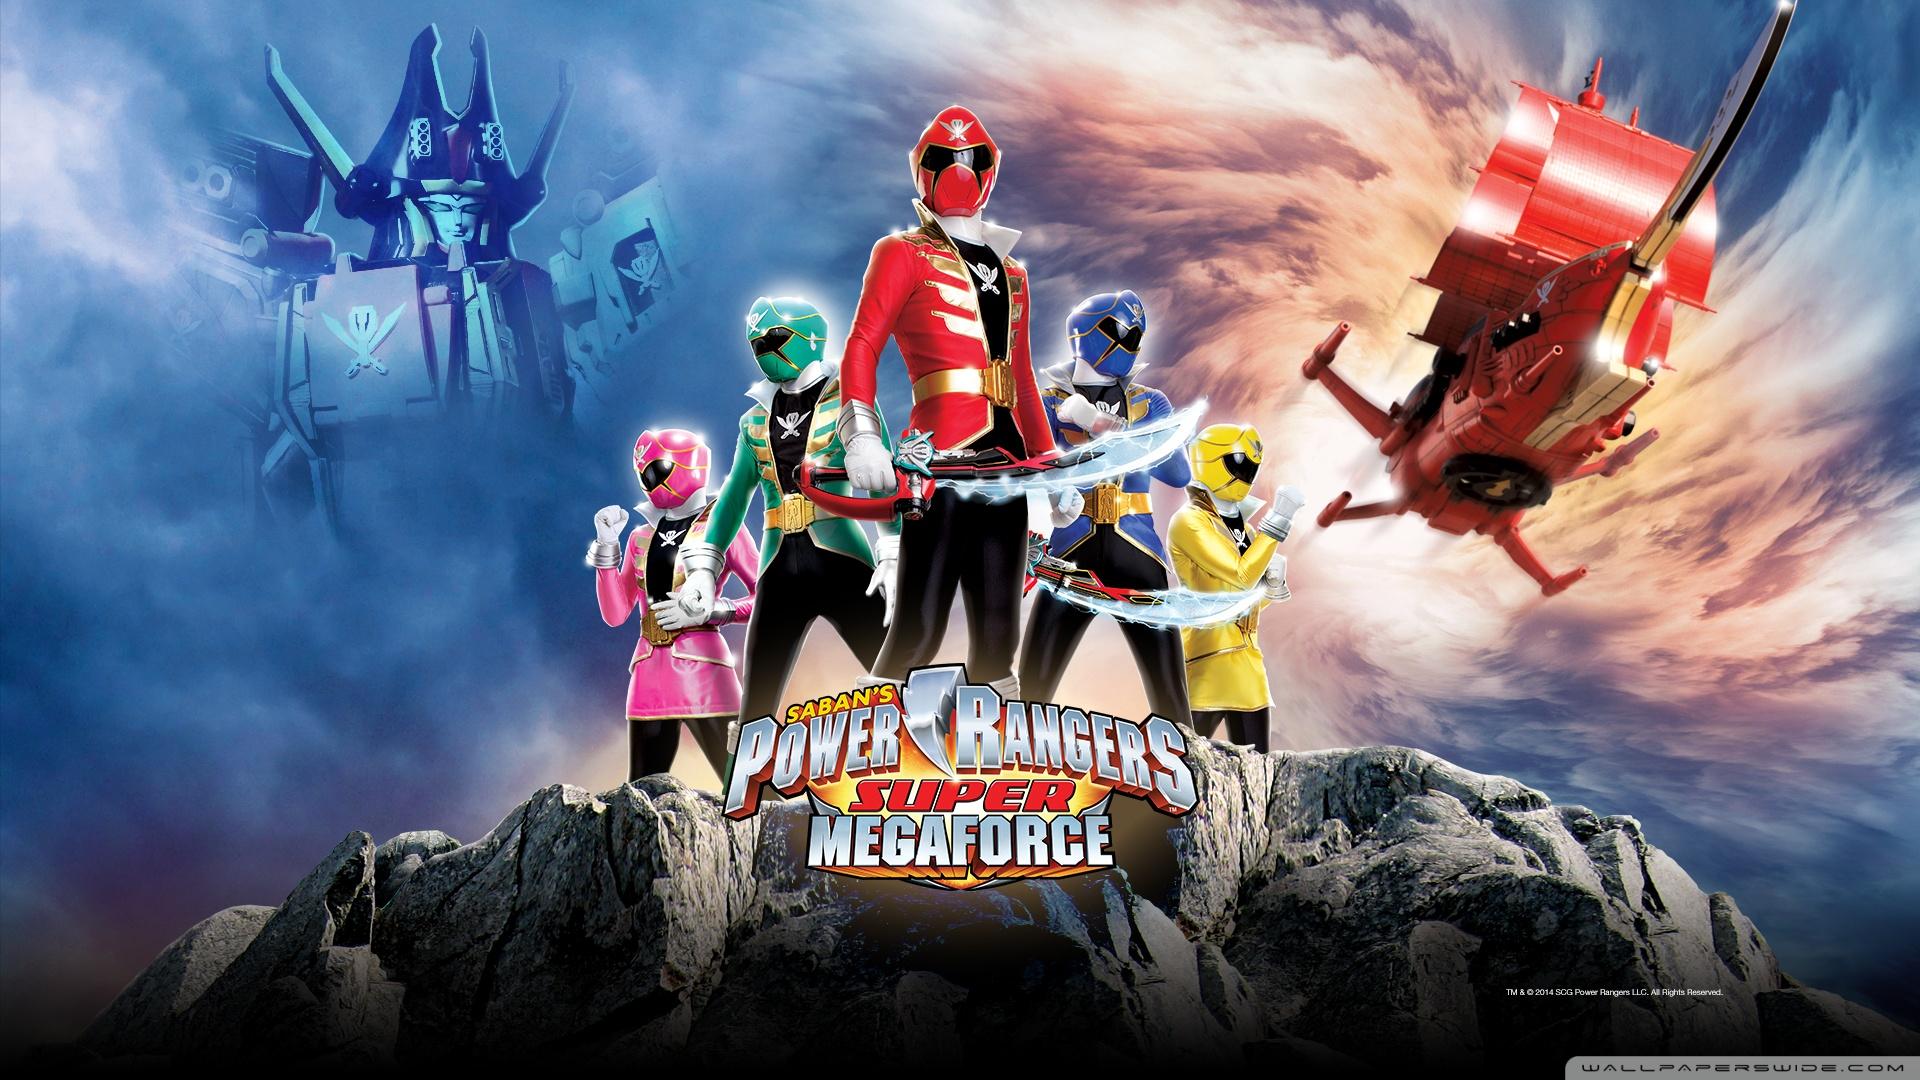 sabans power rangers super megaforce wallpaper